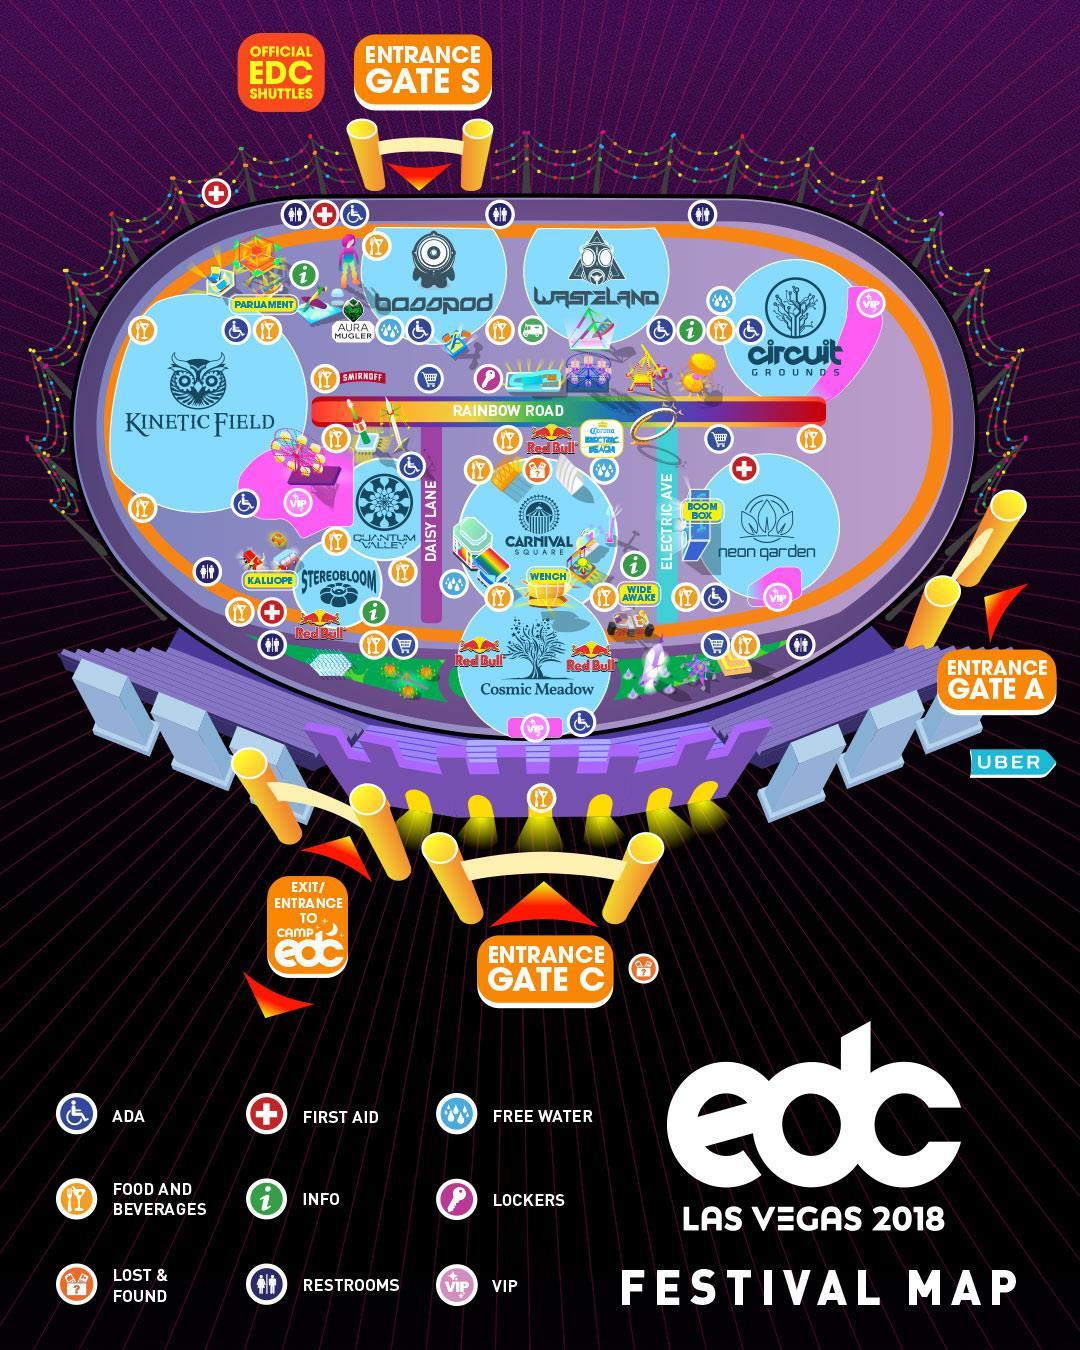 EDC Las Vegas 2018 - Festival Map